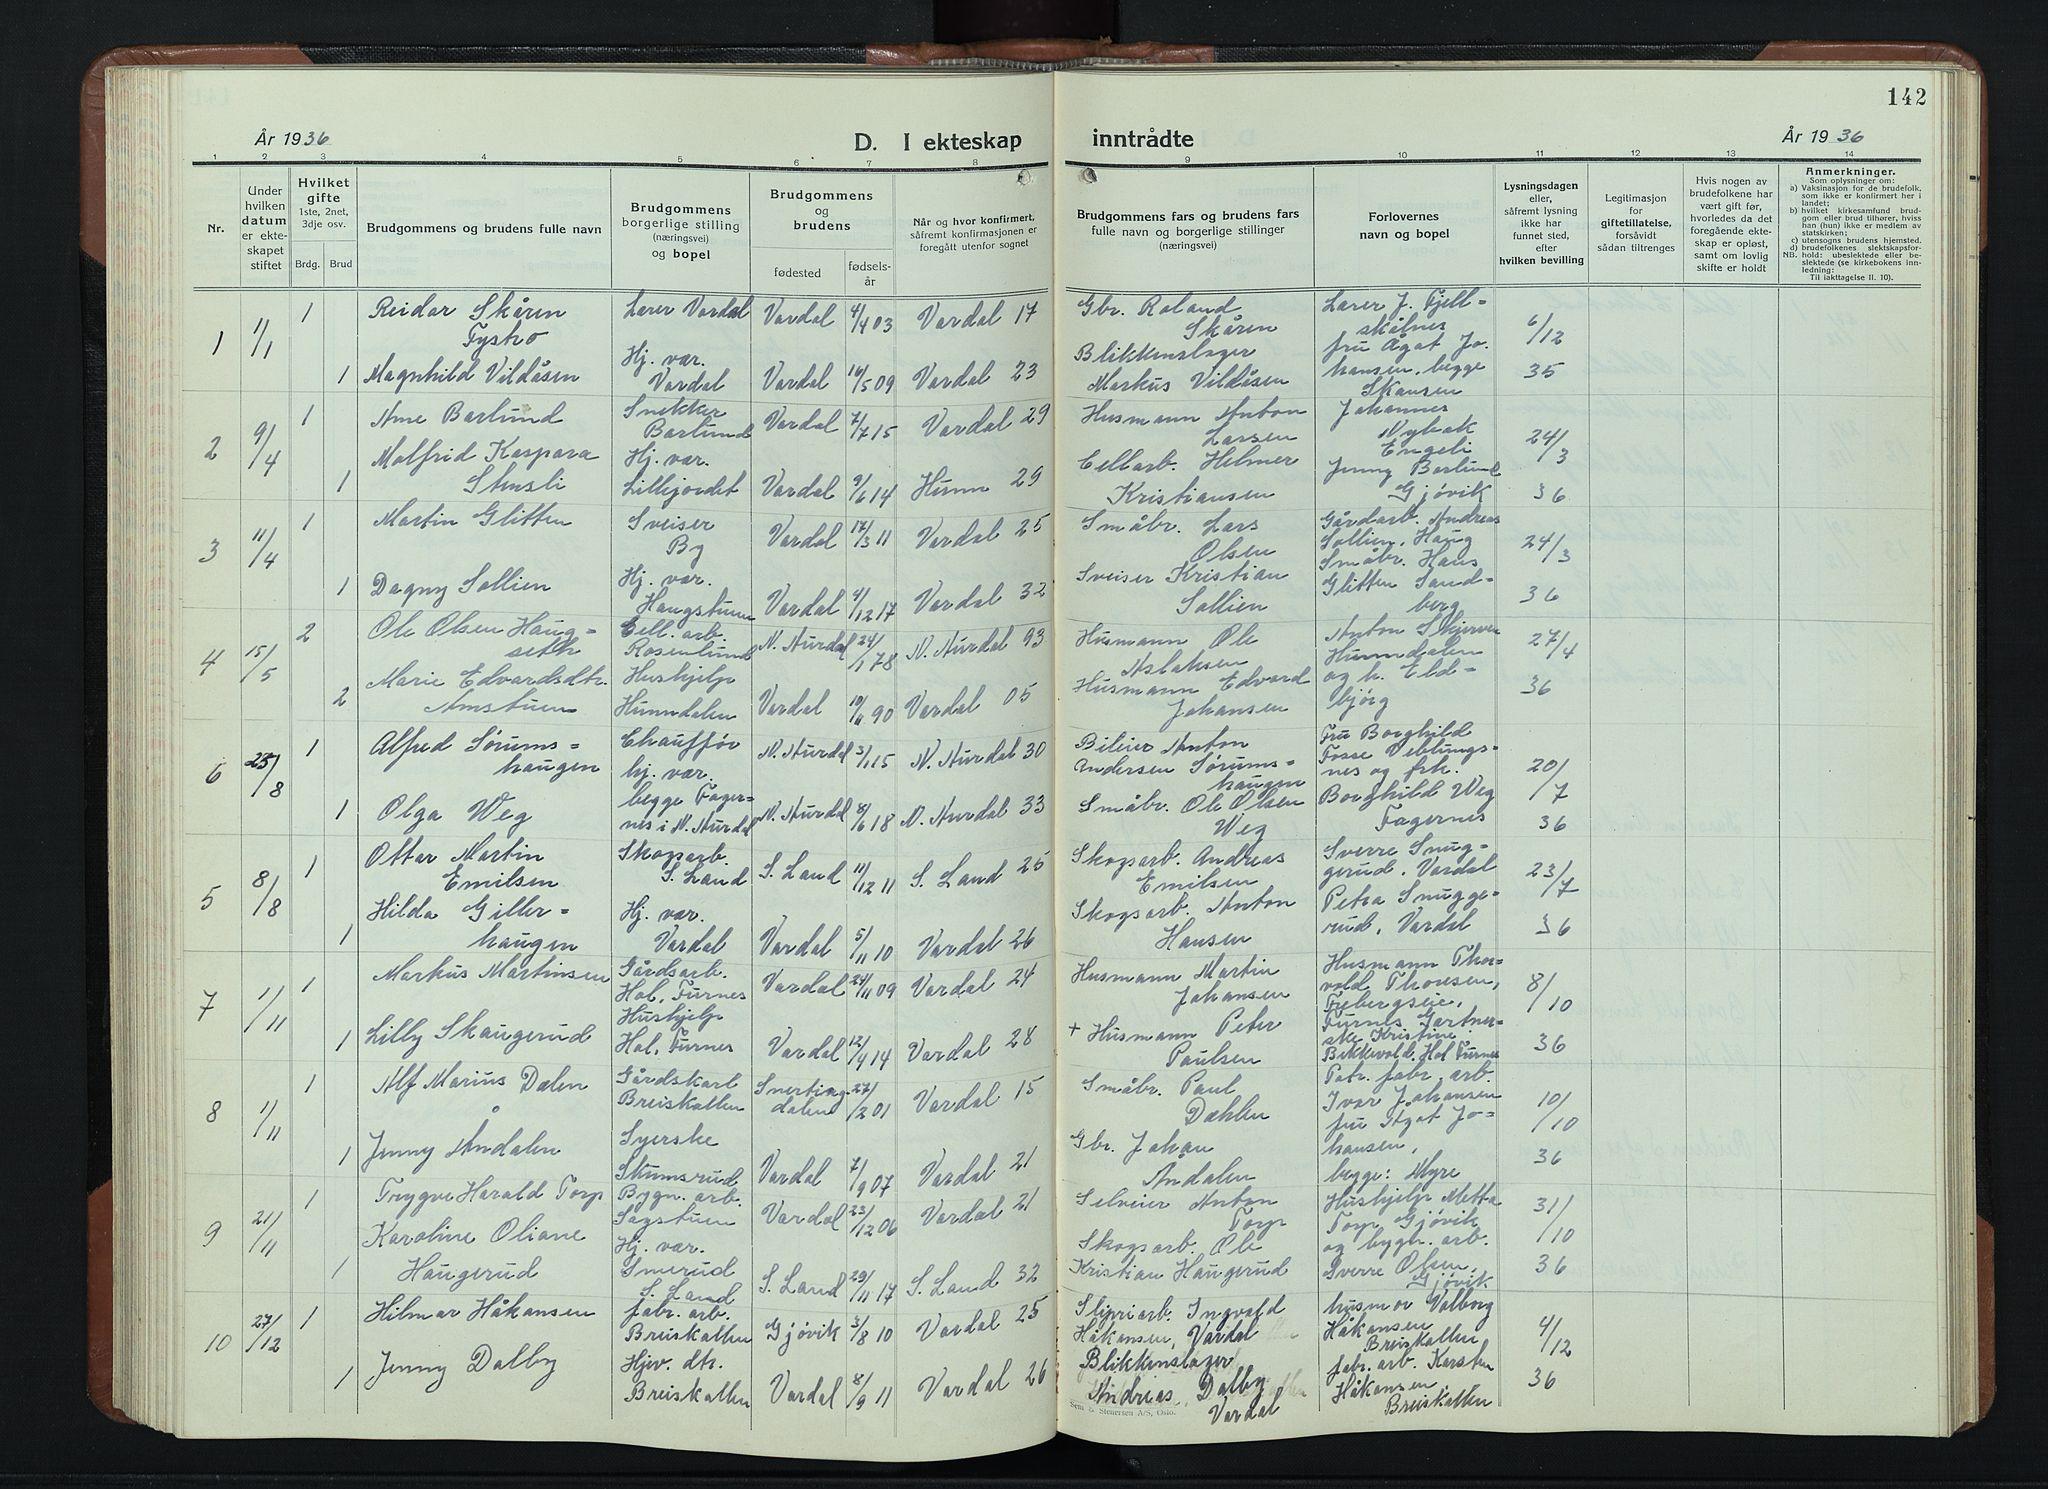 SAH, Vardal prestekontor, H/Ha/Hab/L0018: Klokkerbok nr. 18, 1931-1951, s. 142